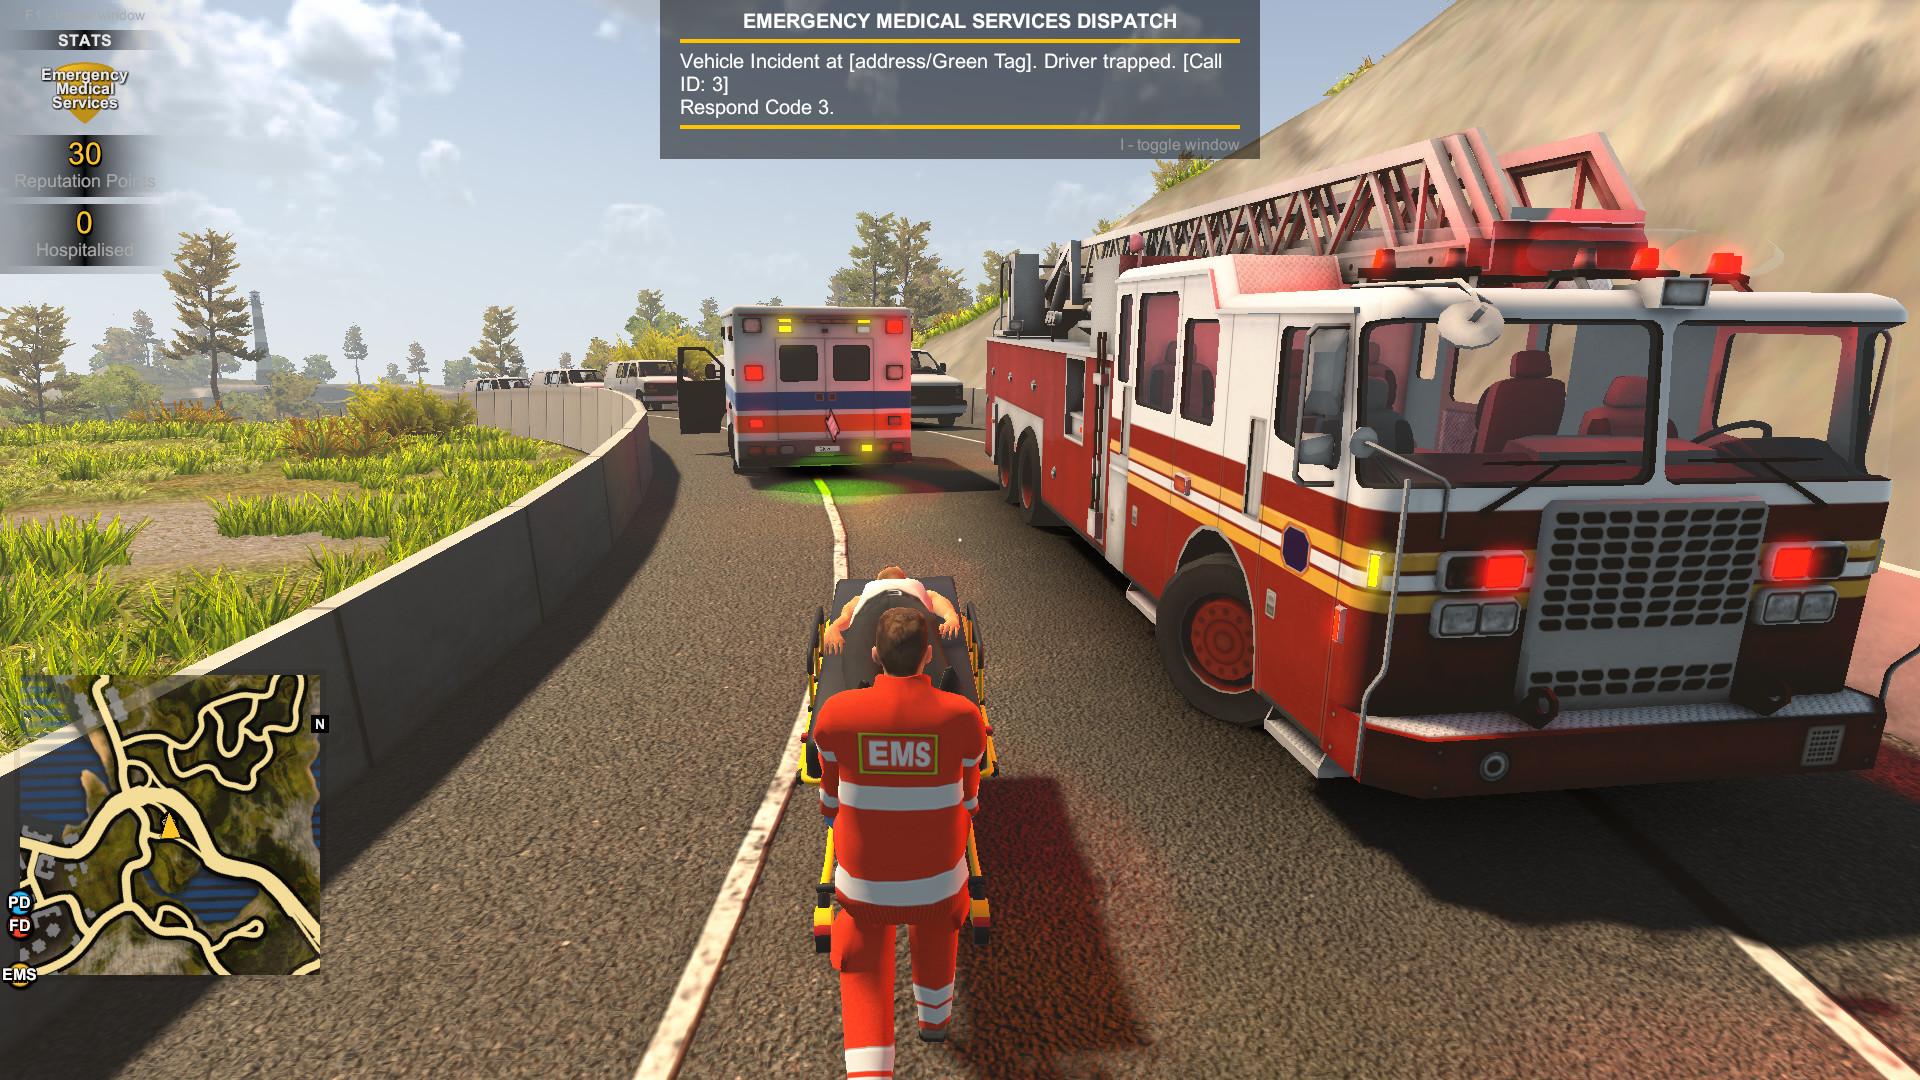 Flashing Lights - Police, Firefighting, Emergency Services Simulator (警情,消防,急救) screenshot